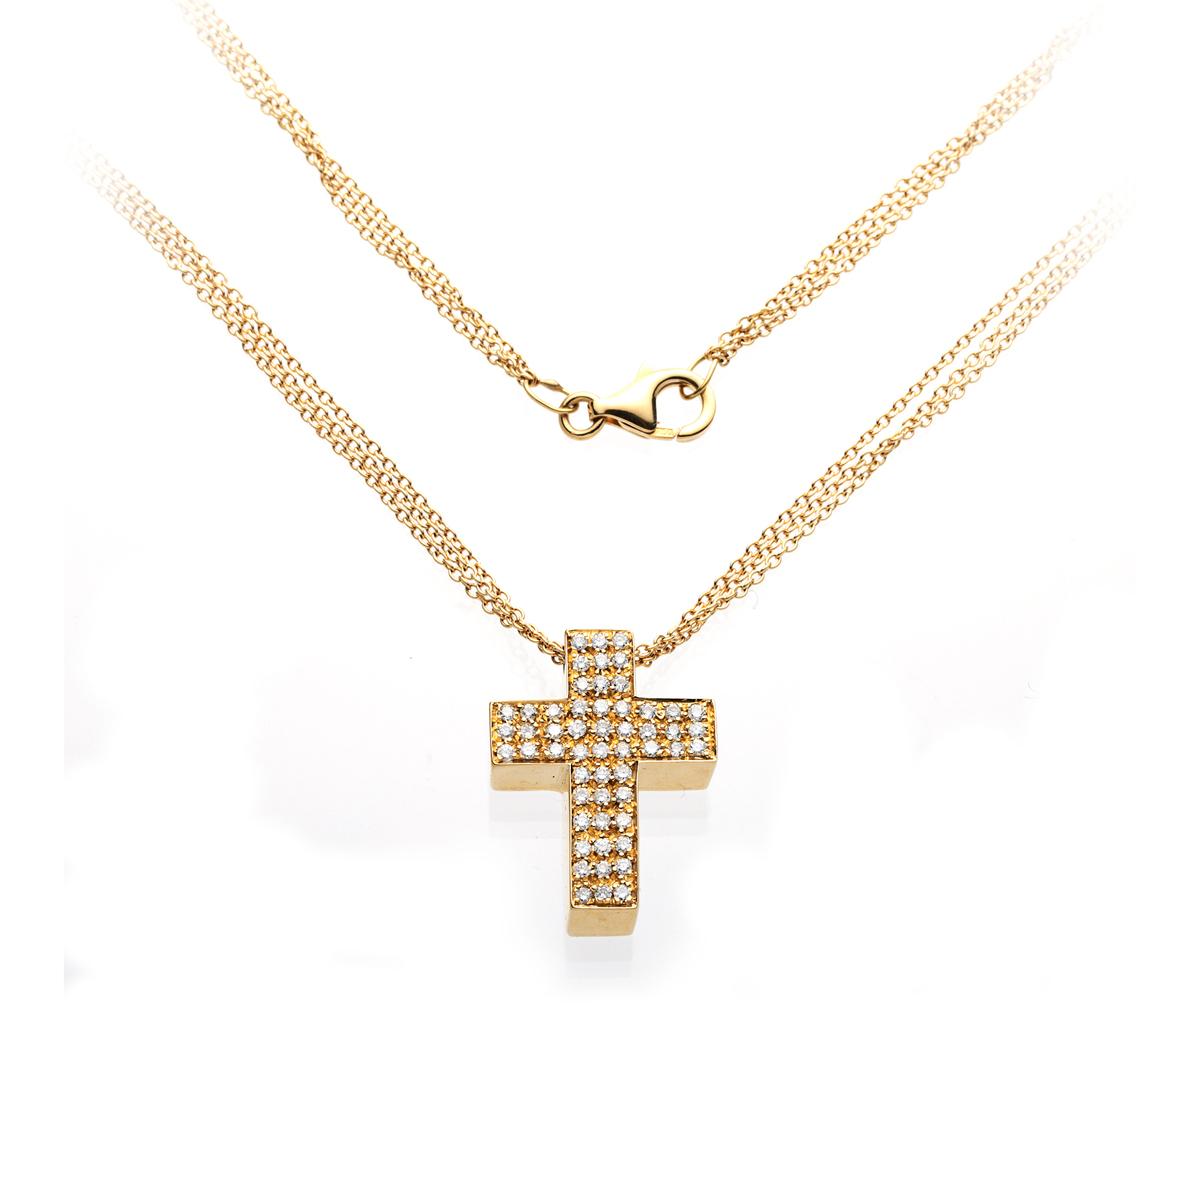 Three-Chain 0.54ct Diamond Cross Pendant Necklace in Yellow Gold